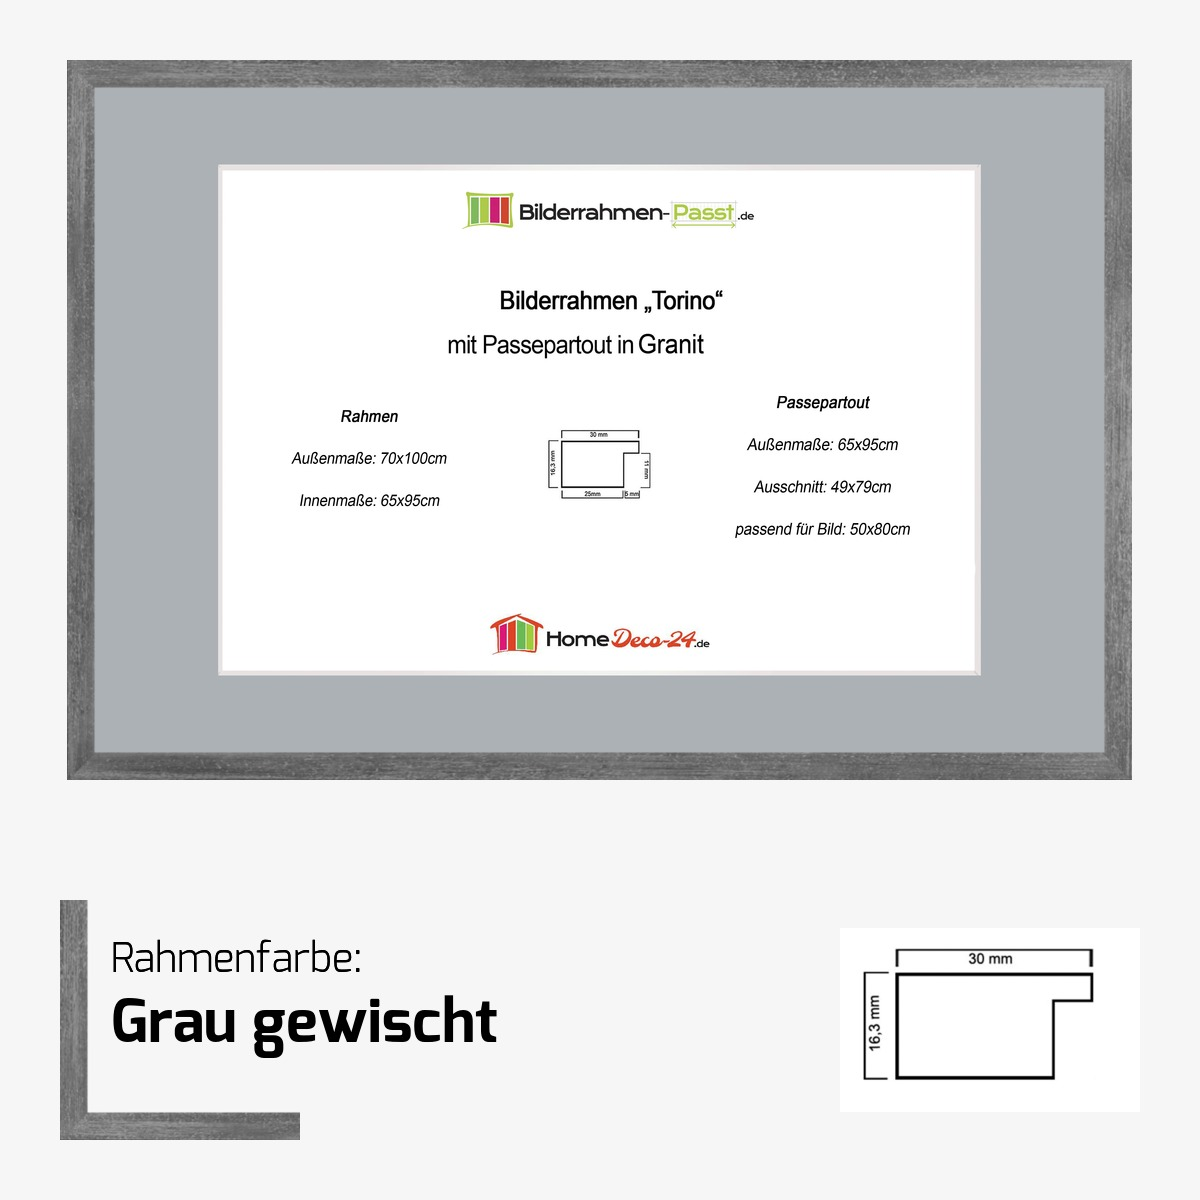 bilderrahmen torino grau 65 x 95 cm passepartout farbwahl f r bild 50x80. Black Bedroom Furniture Sets. Home Design Ideas